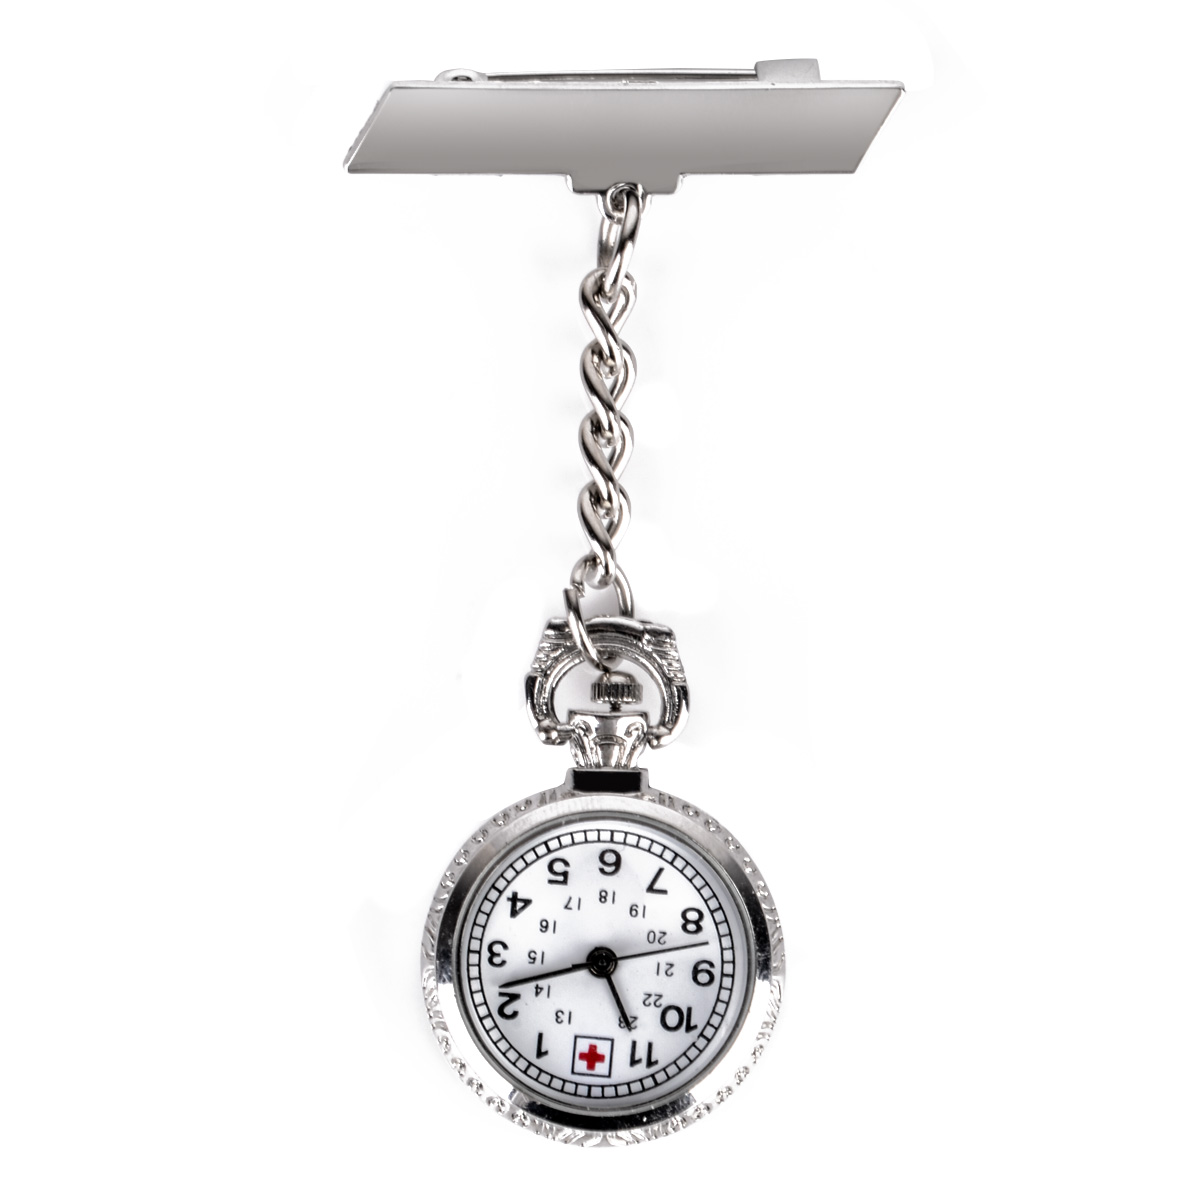 Fashion Medical Doctor Nurse Quartz Pocket Watches Silver Metal Chain Clip On Pendant Chain Man Women Clock Brooch Fob Watch